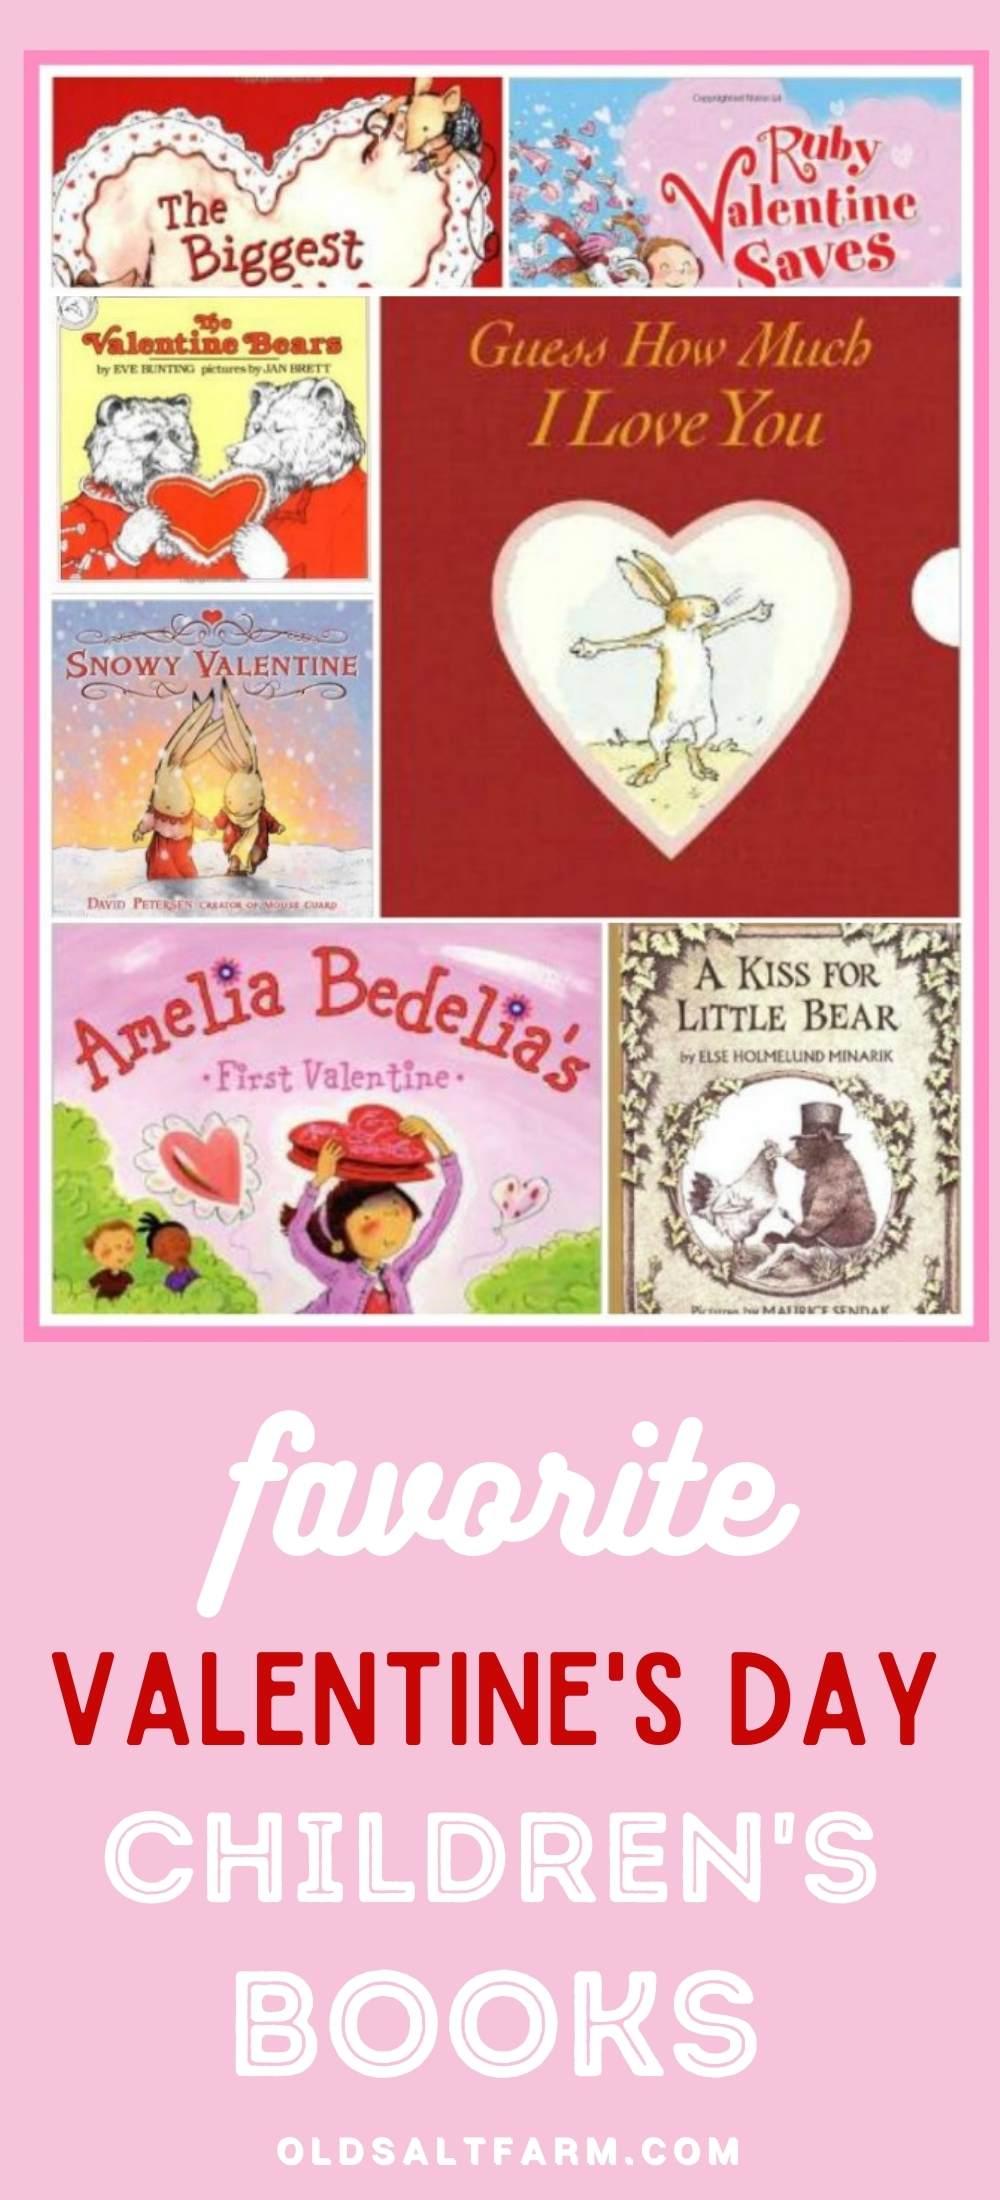 14 Valentine's Day Children's Books